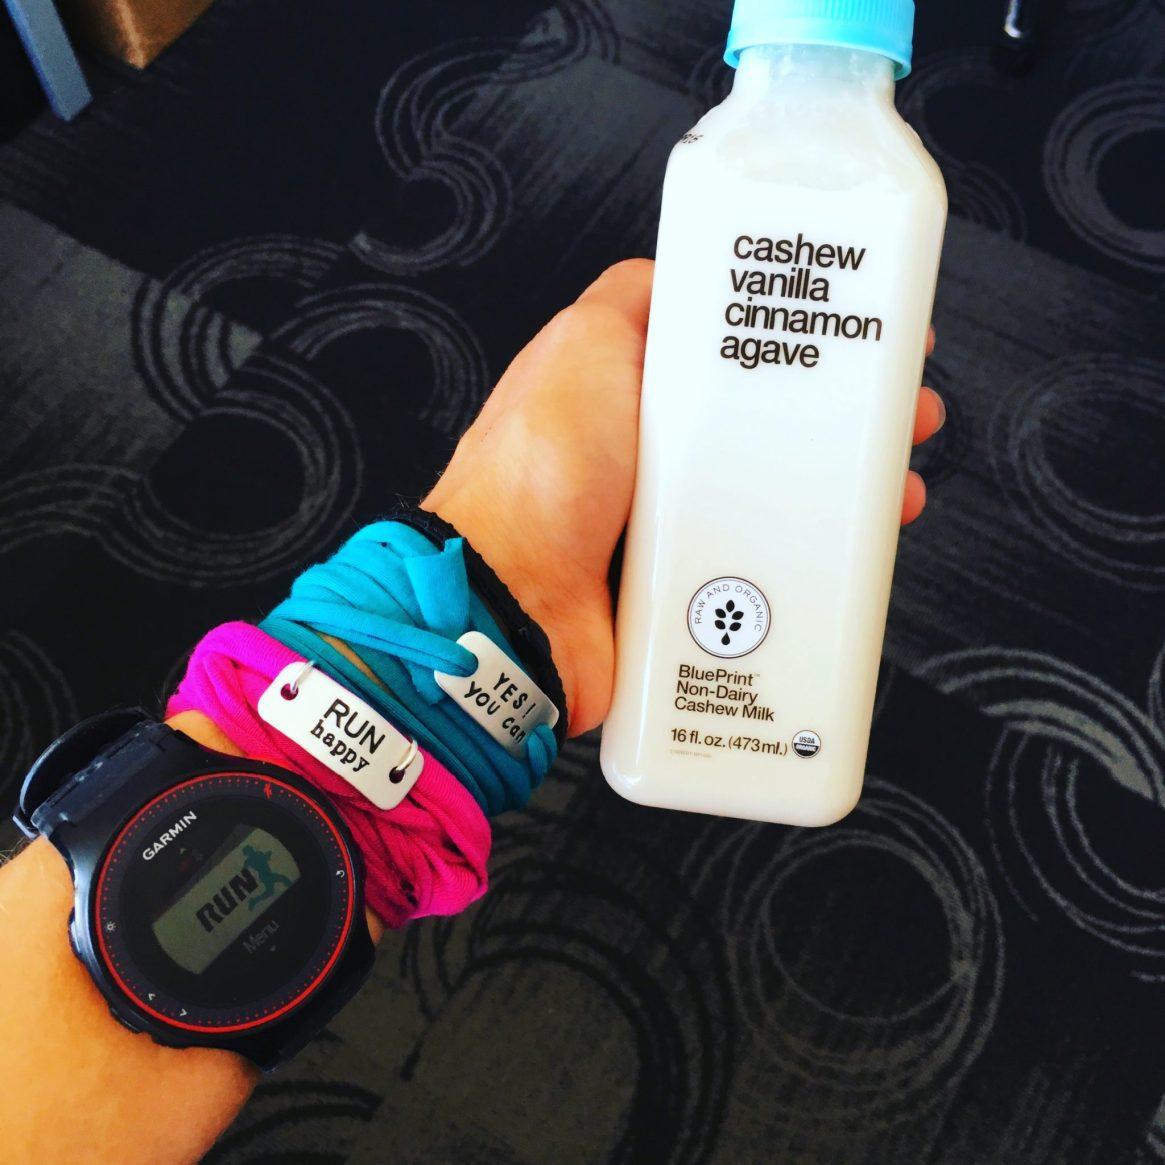 blue print cleanse, cashew milk, momentum jewelry, run happy, garmin, garmin fitness